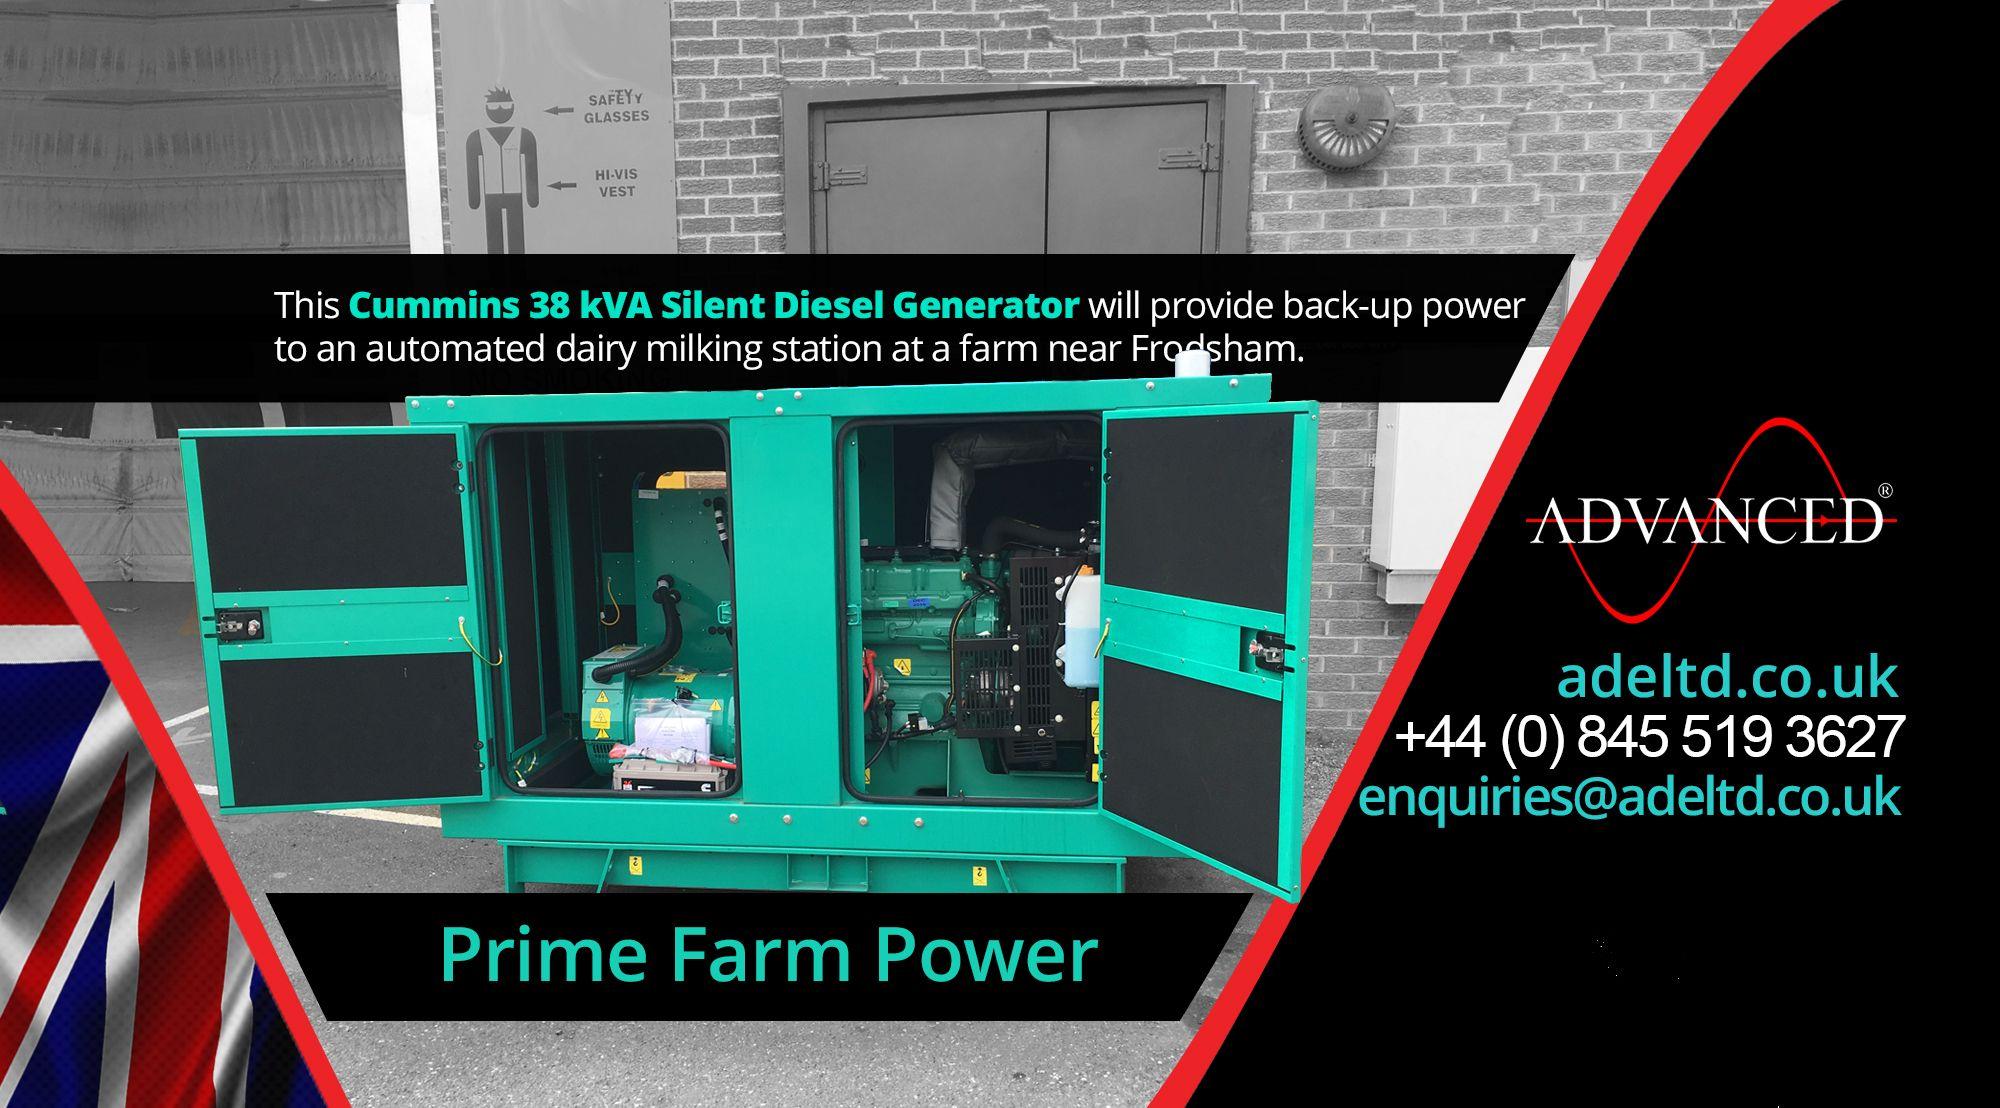 Prime Farm Power This Cummins 38 kVA Silent Diesel Generator will